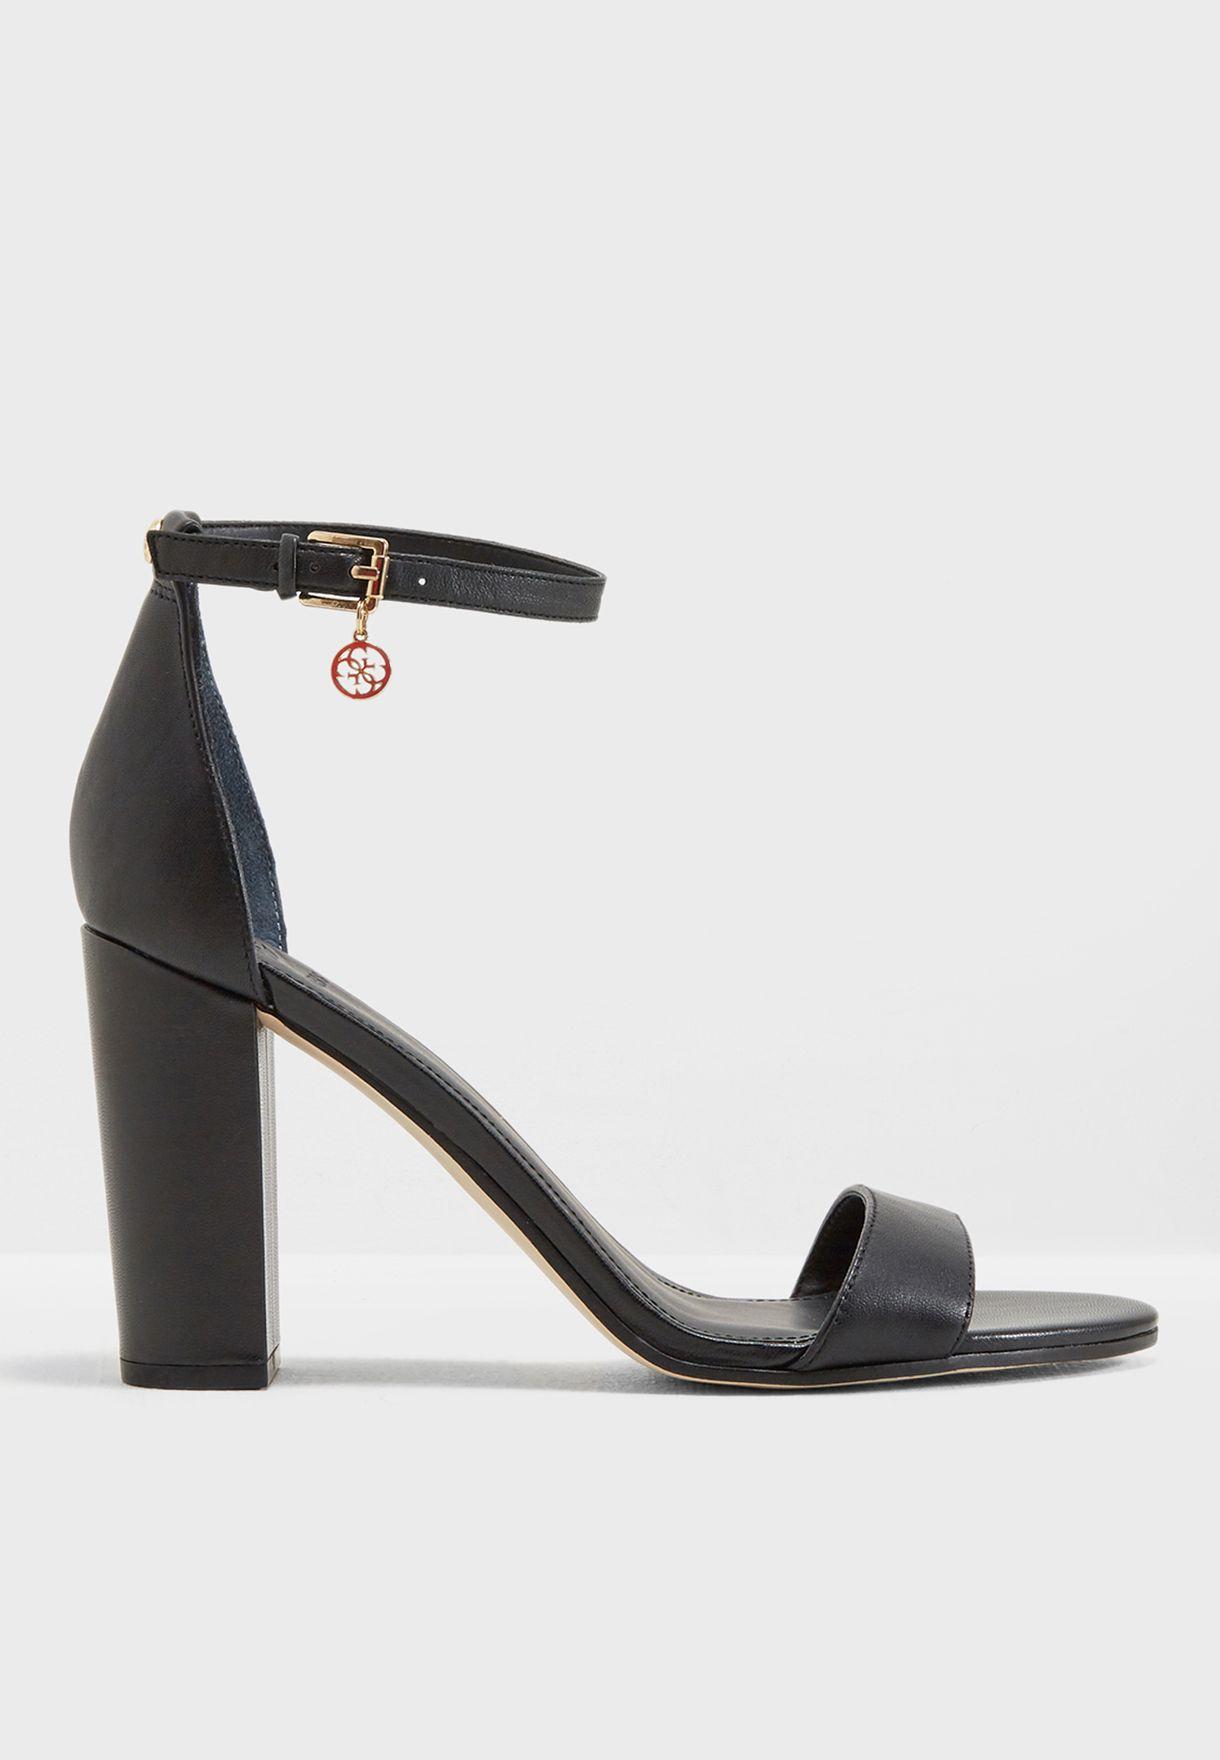 334c2f07202 Shop Guess black Block Heel Sandal gwBAMBOO for Women in Qatar -  GU094SH48YZF